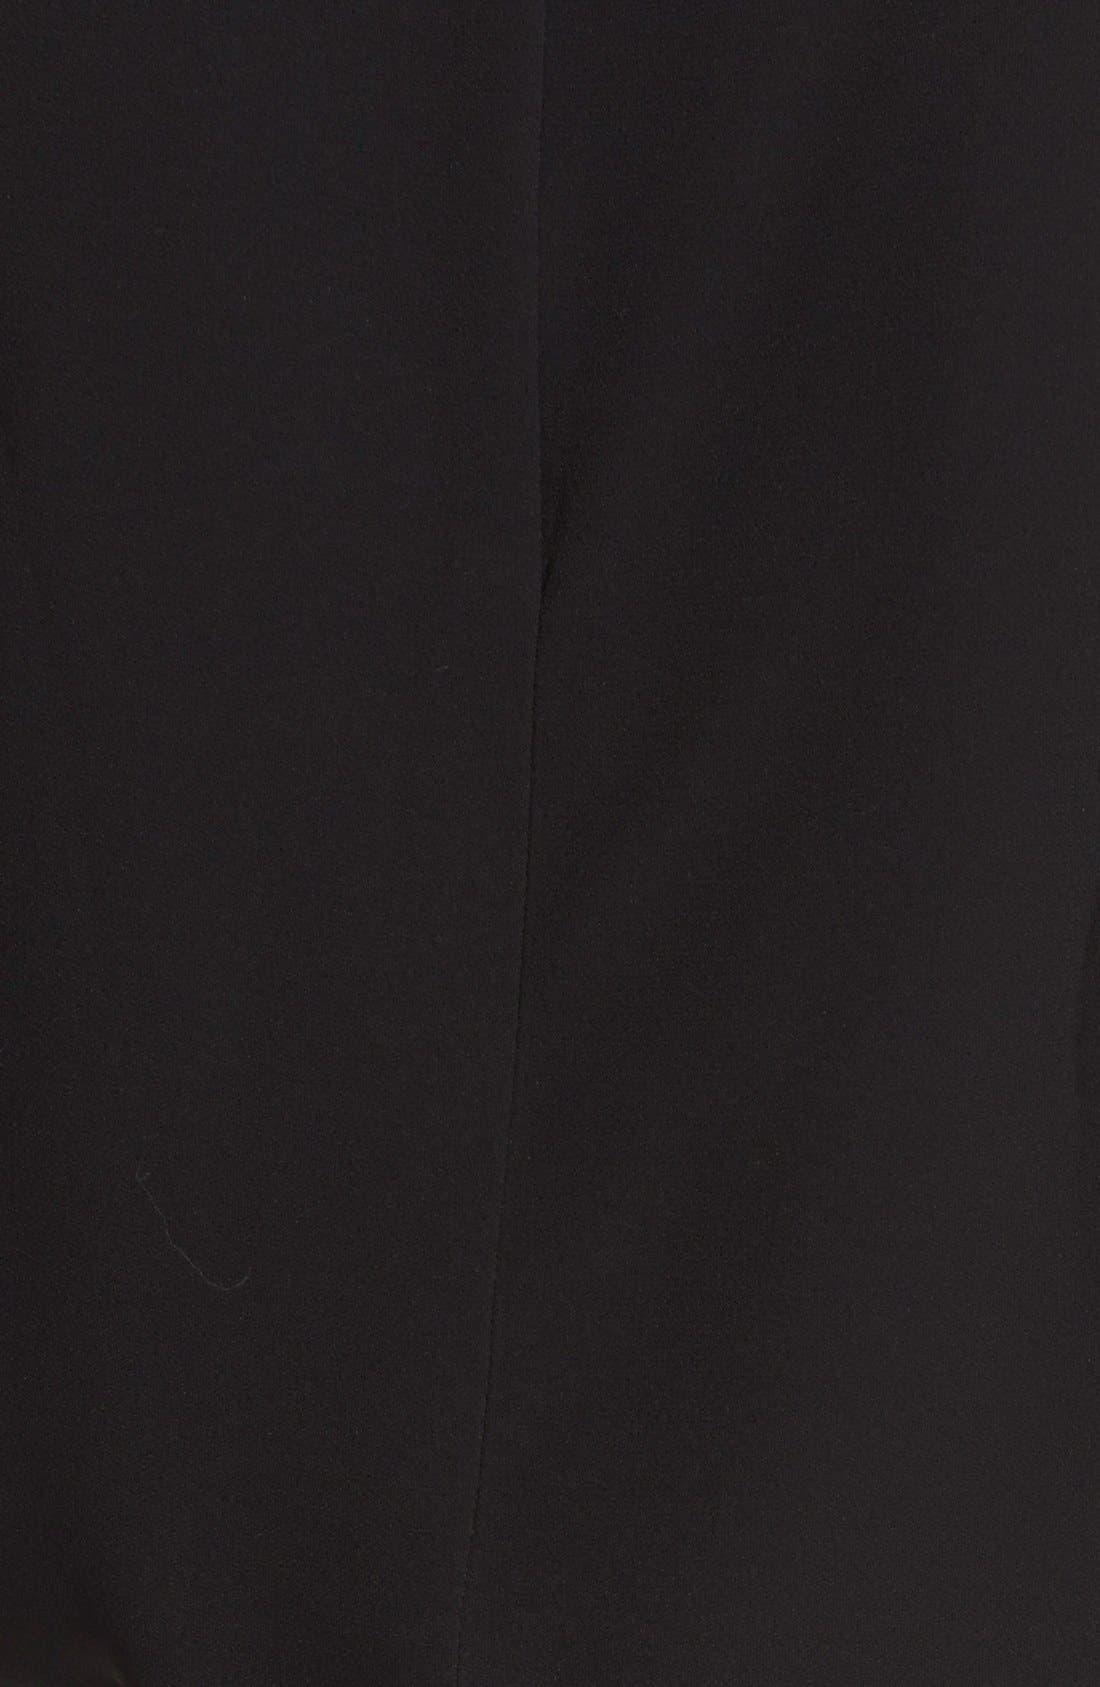 'Keaton' Sleeveless Crepe Top,                             Alternate thumbnail 3, color,                             Black